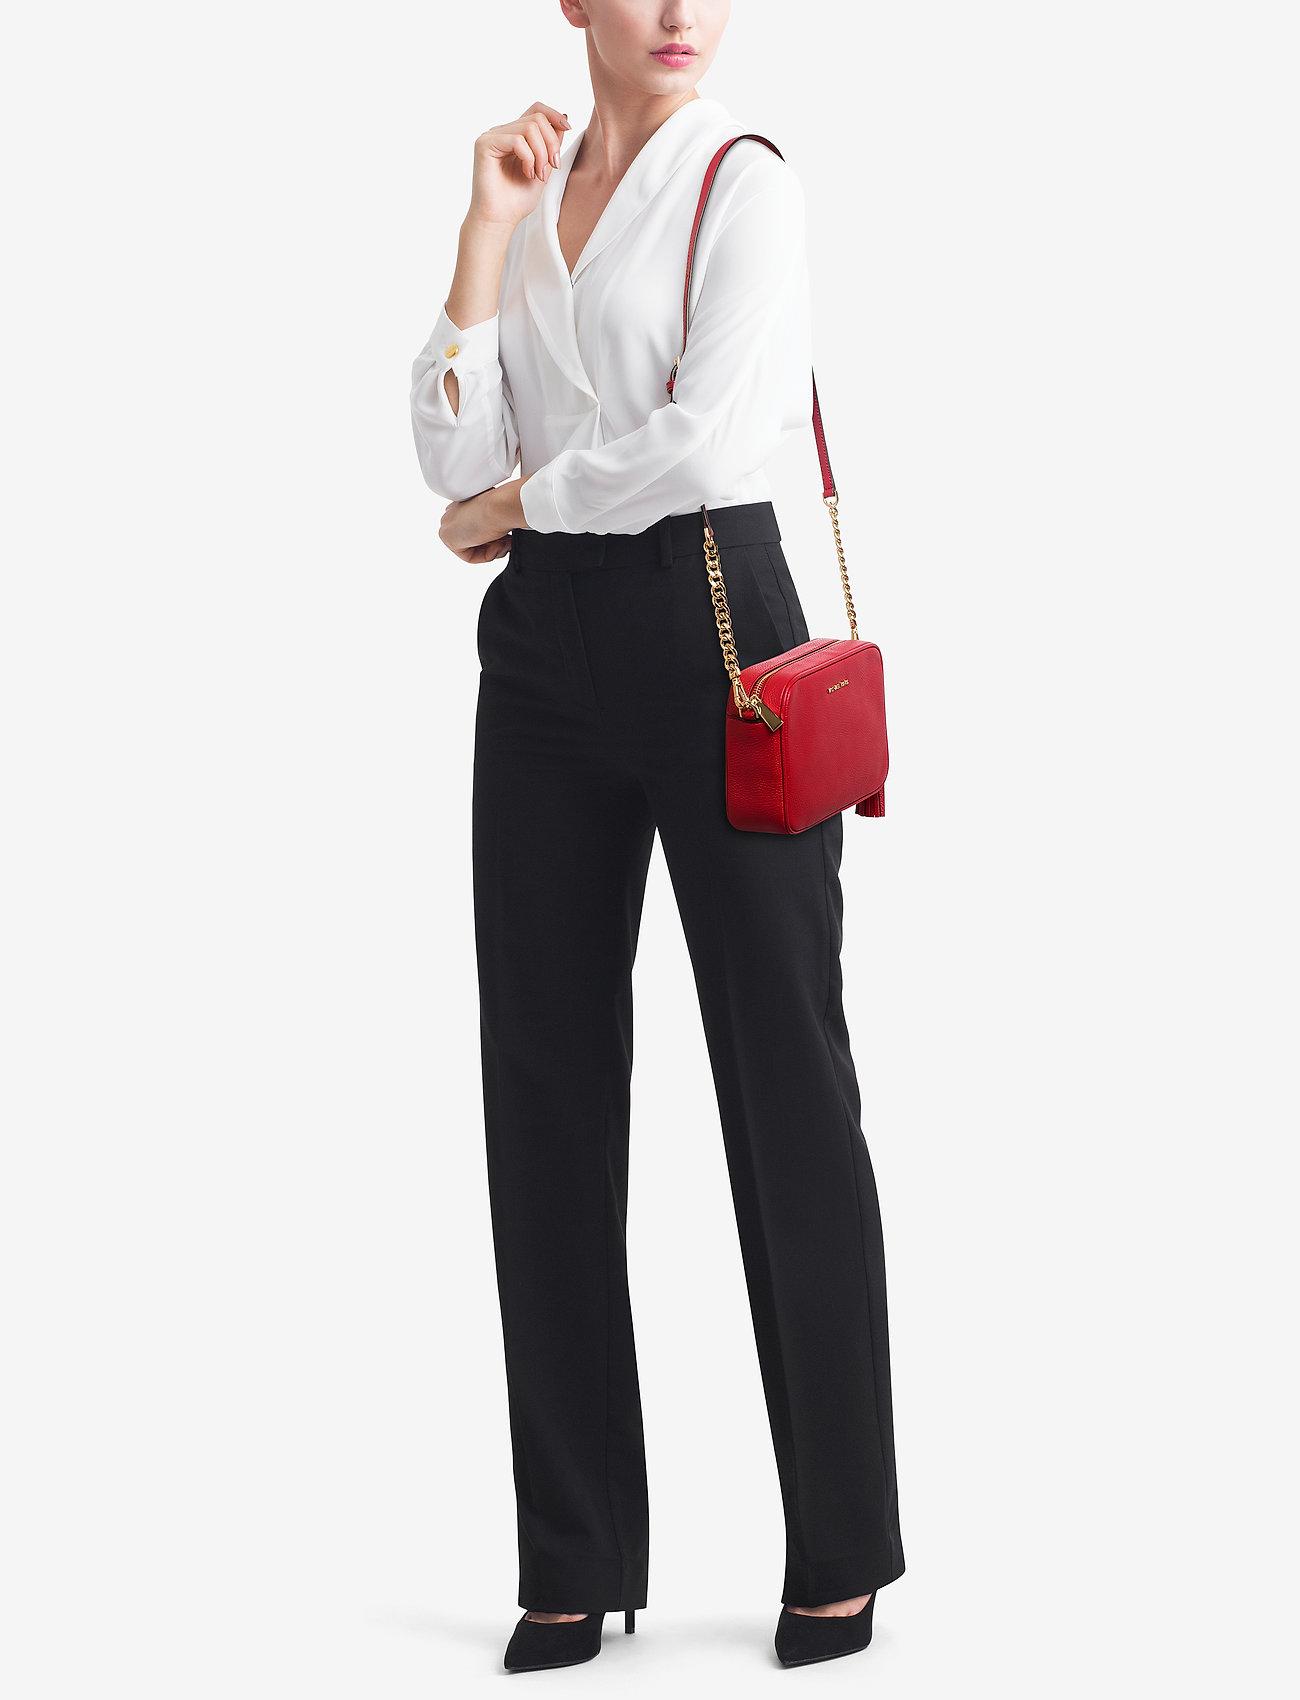 Michael Kors Bags MD CAMERA BAG - BRIGHT RED